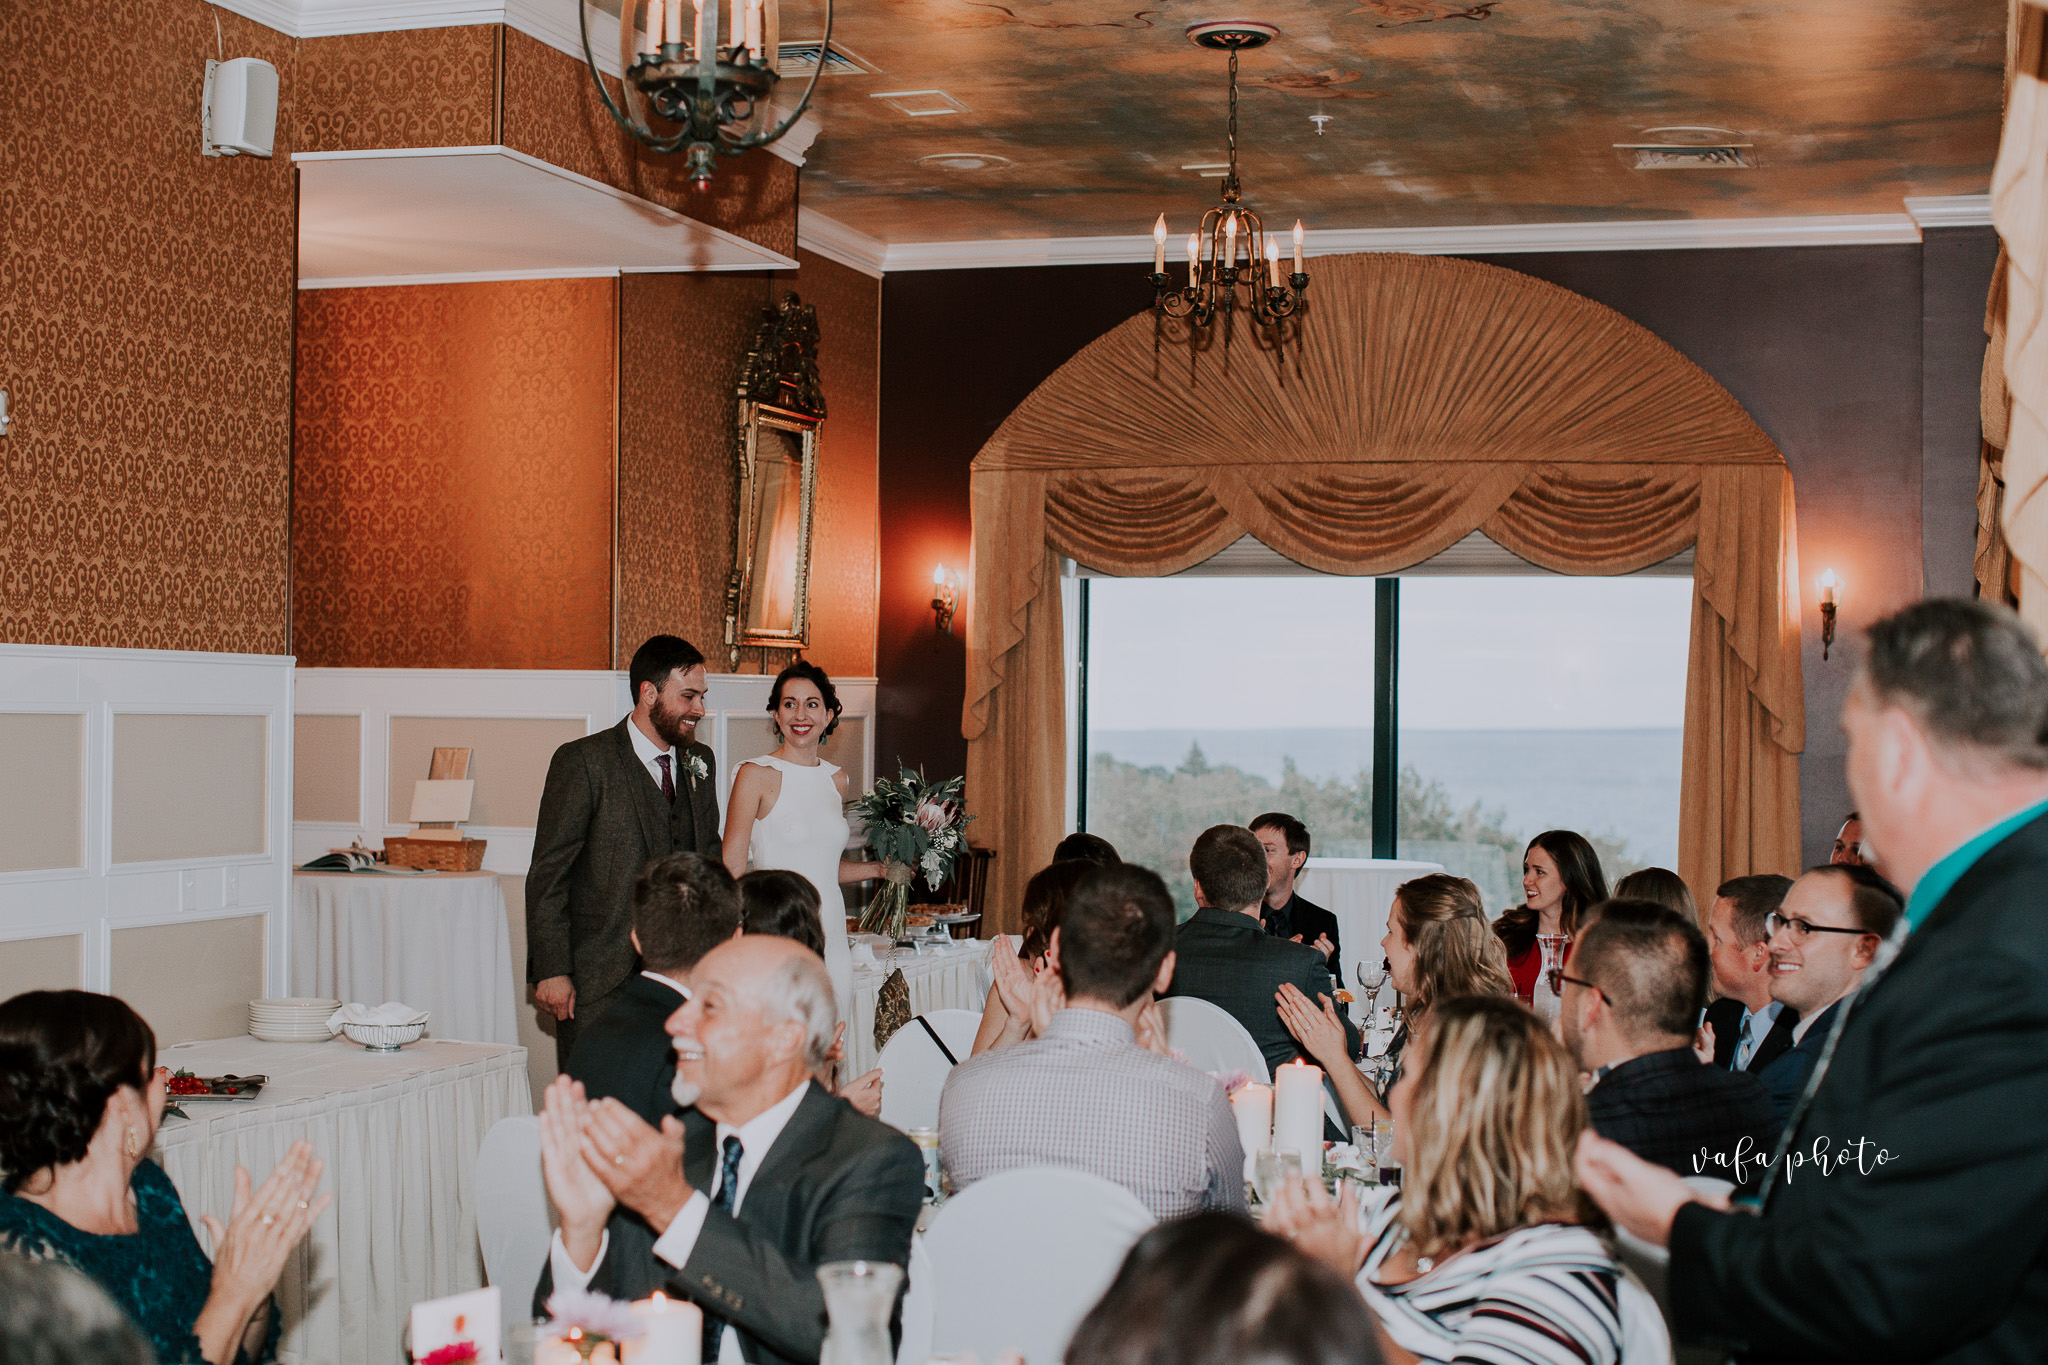 Little-Presque-Isle-Michigan-Wedding-Kim-Kyle-Vafa-Photo-651.jpg